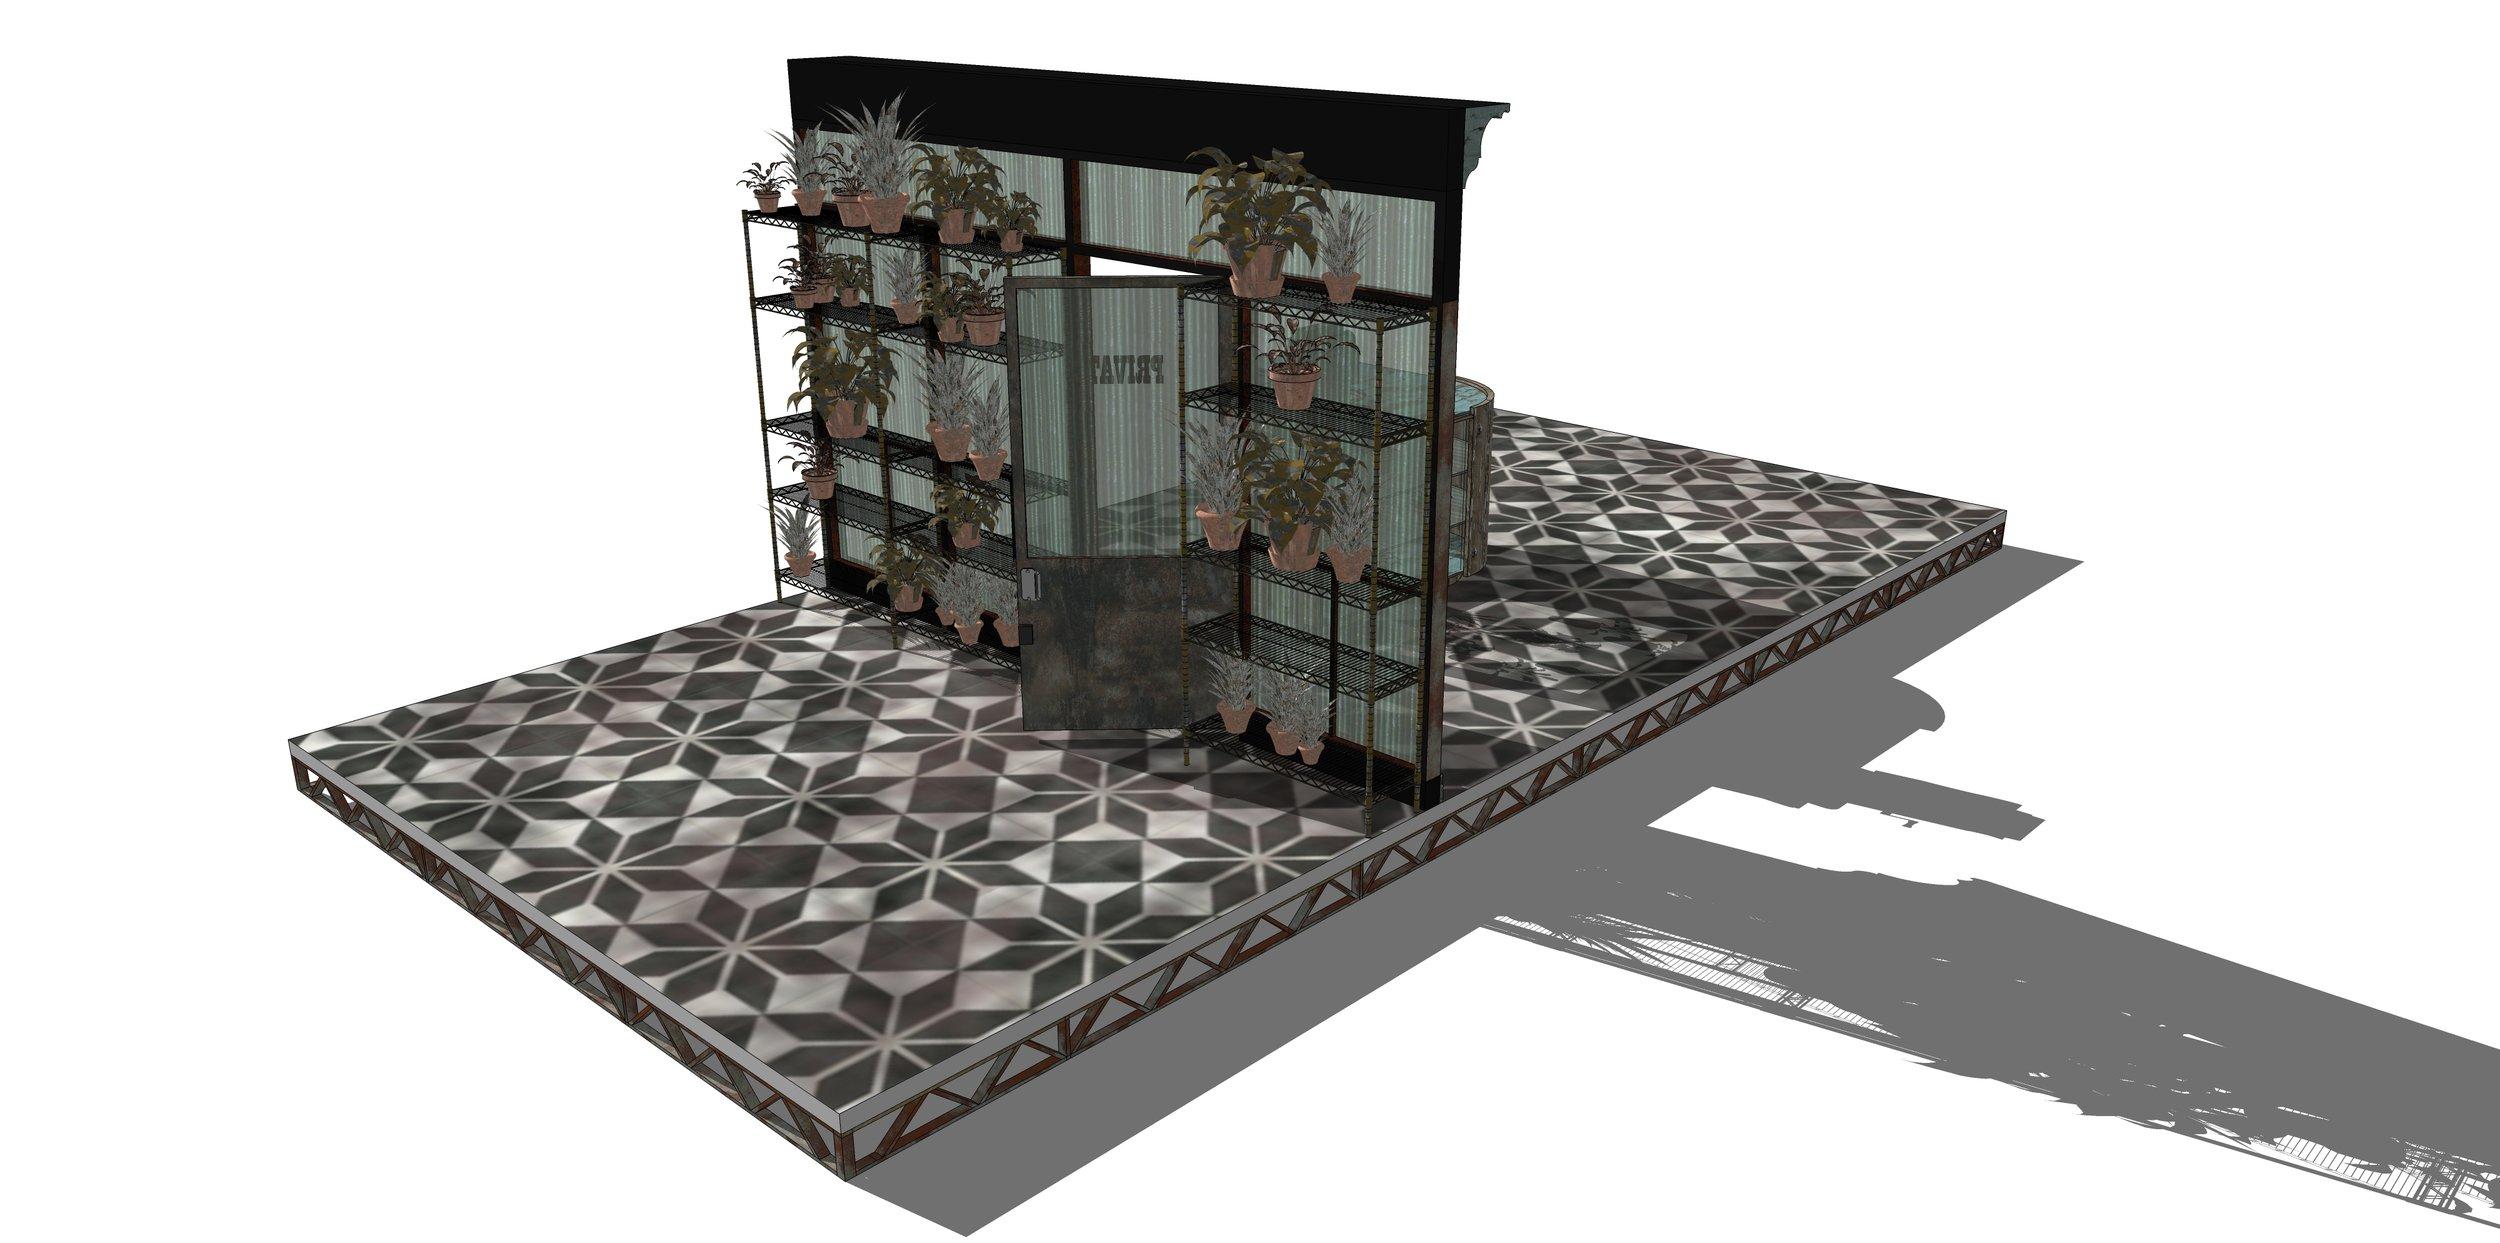 LSOH Shop Interior Truck Design 3.jpg